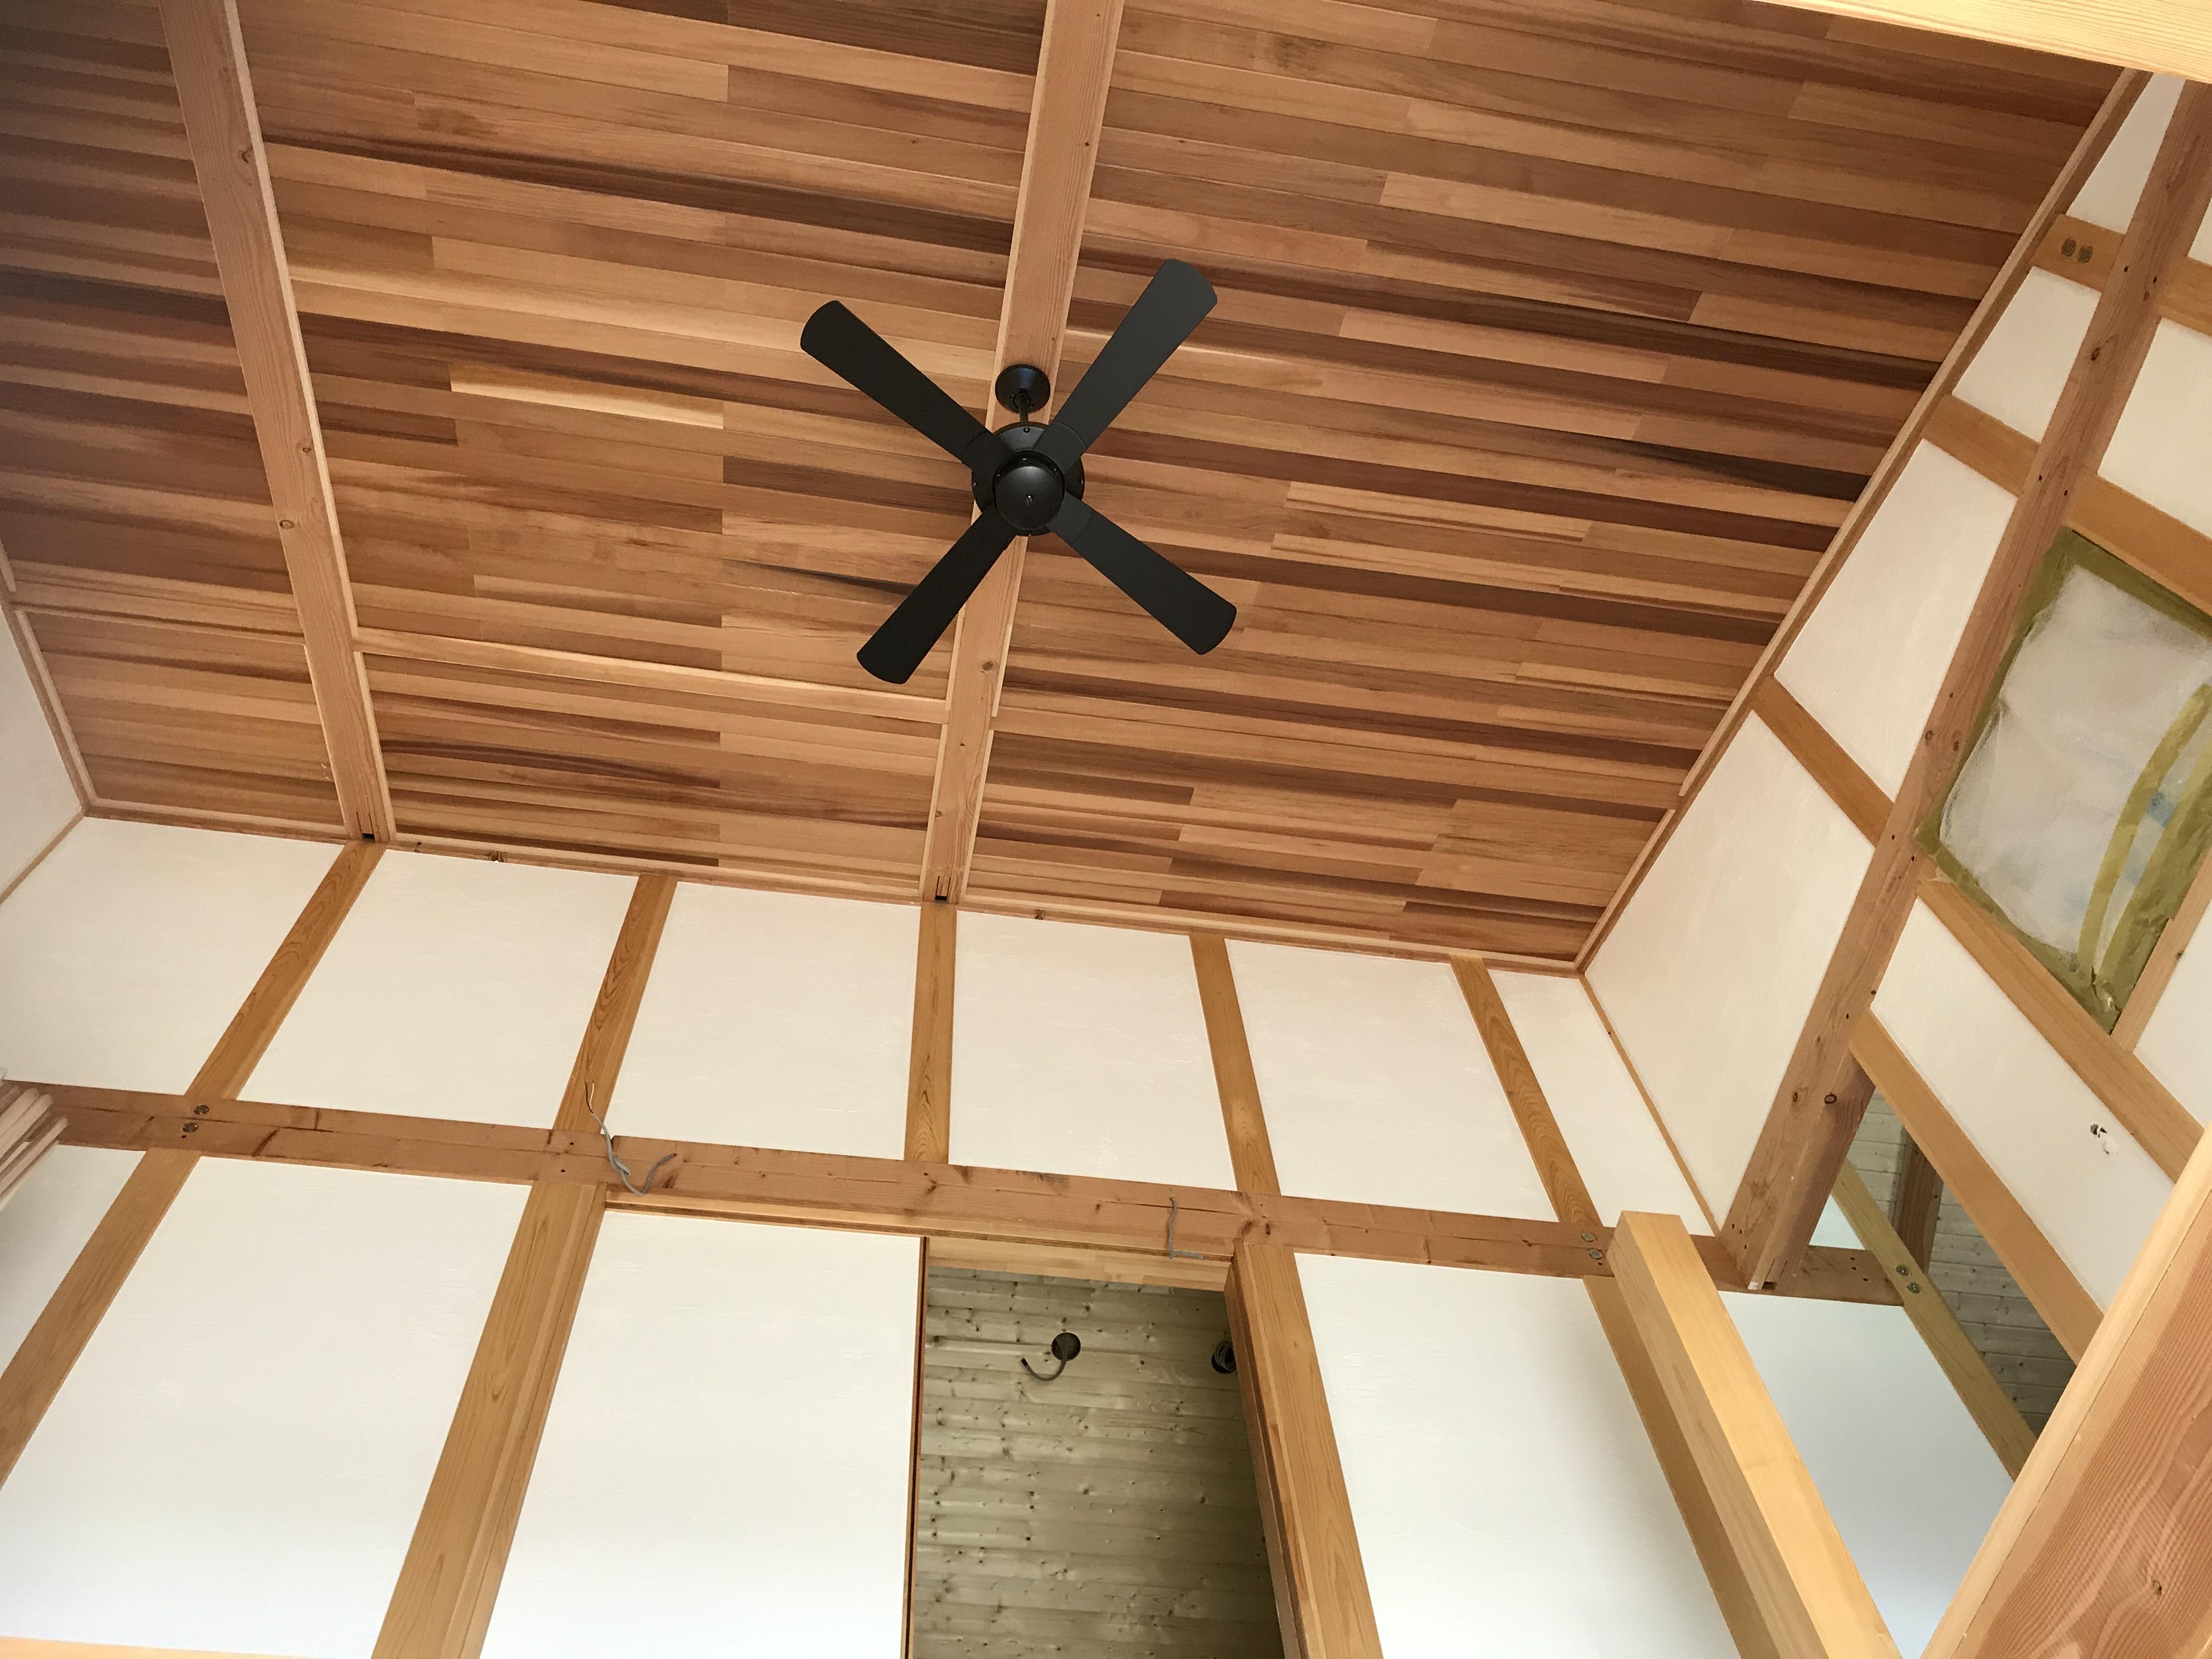 IMG_1348 - 坂井工務店 | 山口県山口市佐山 | 木造住宅、注文住宅の工務店